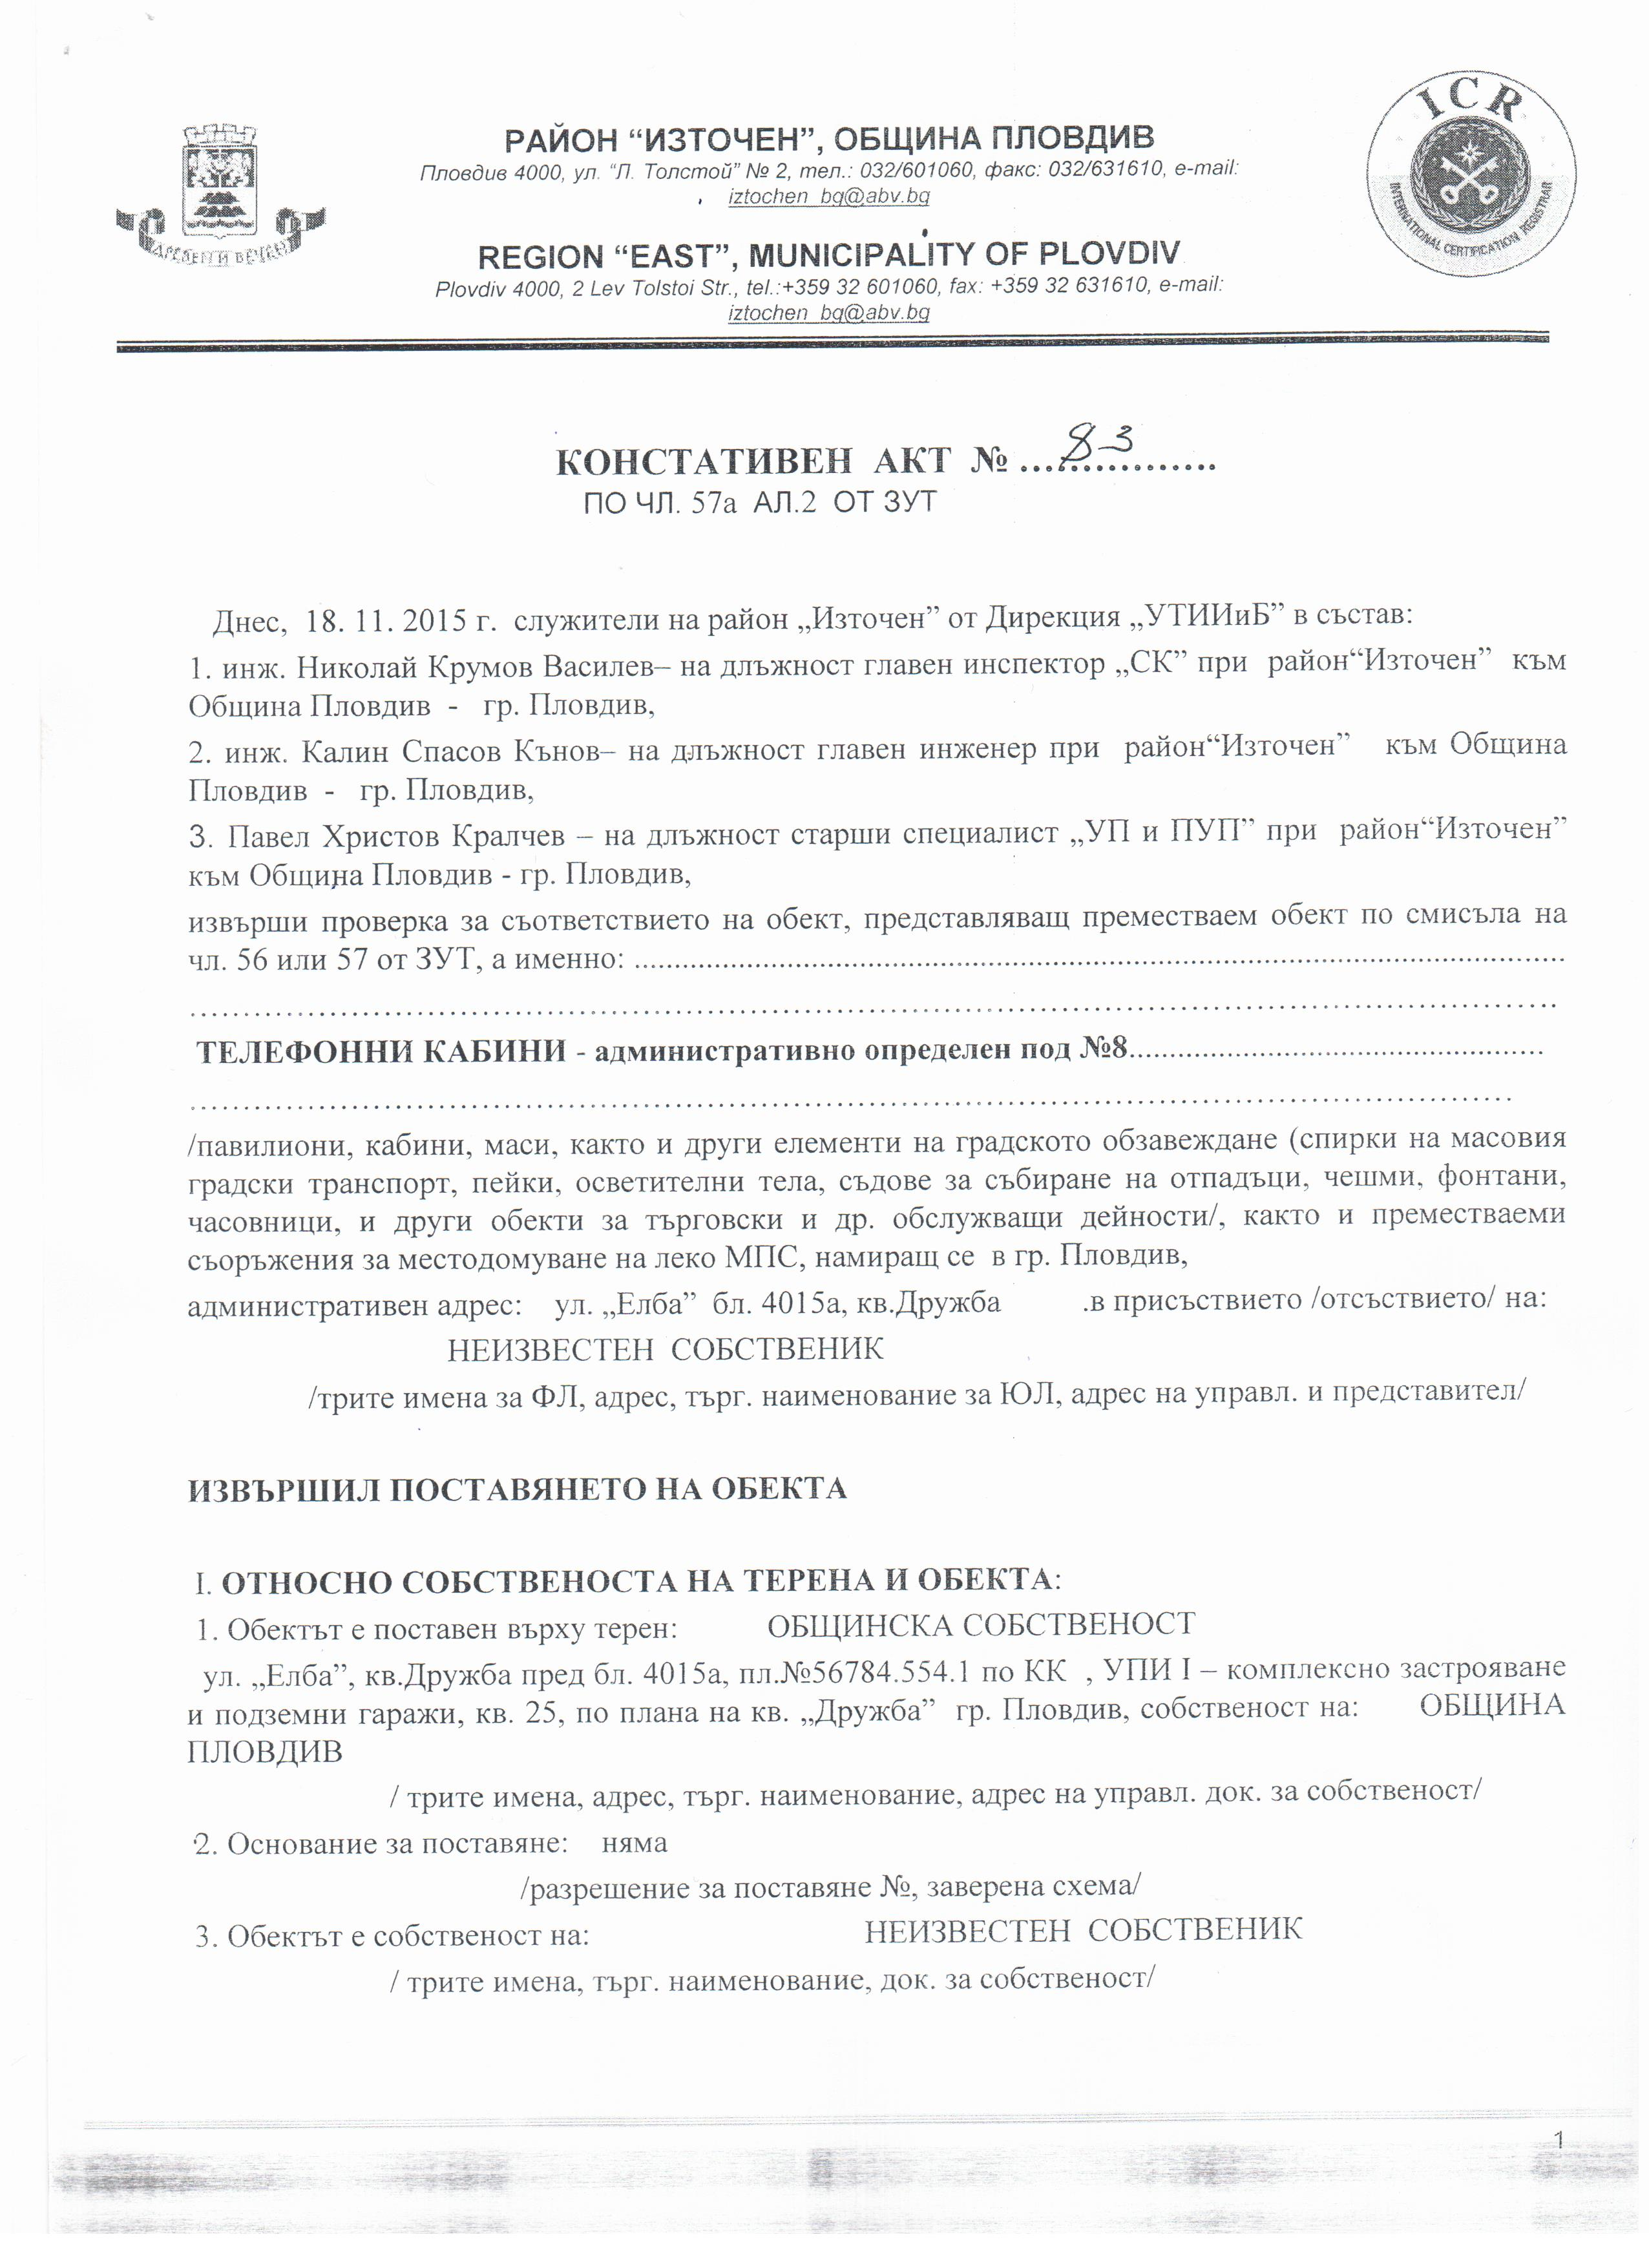 KONSTATIVEN_AKT_№83